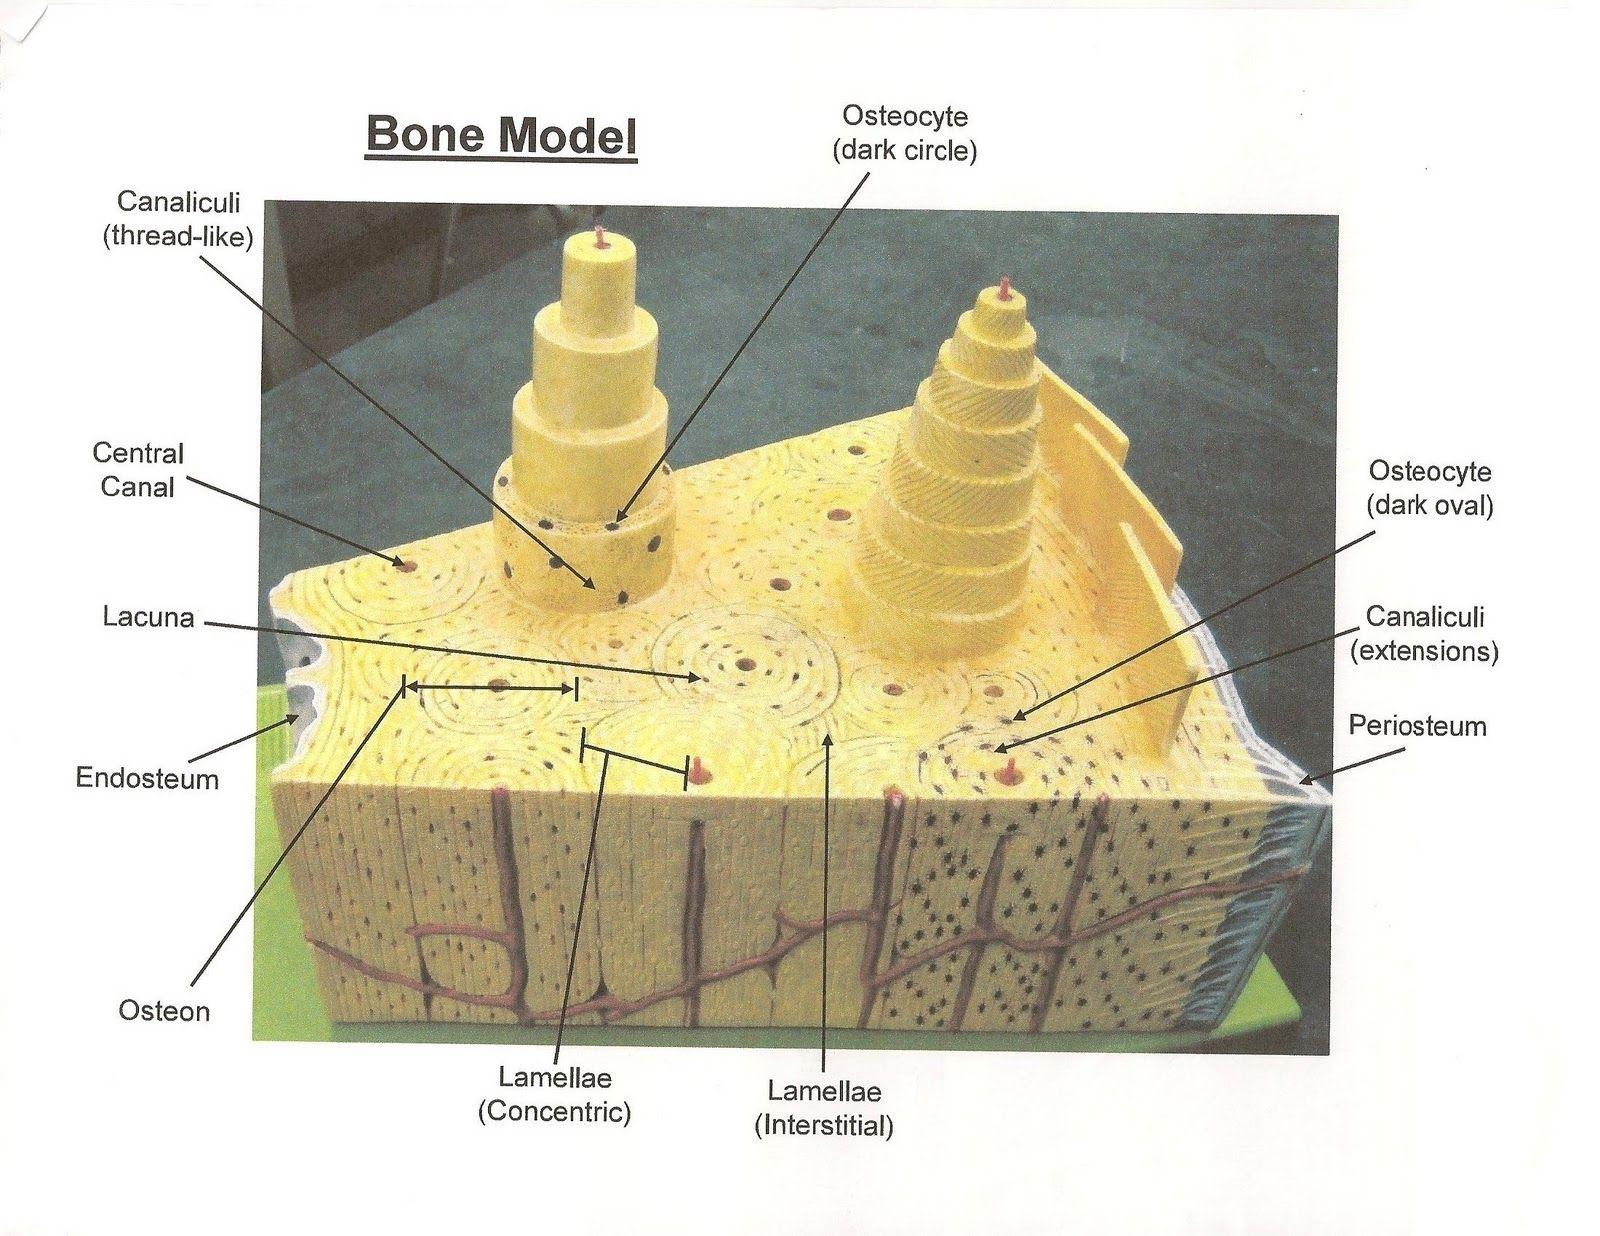 Compact Bone Diagram Human Anatomy Drawing Cell Model Human